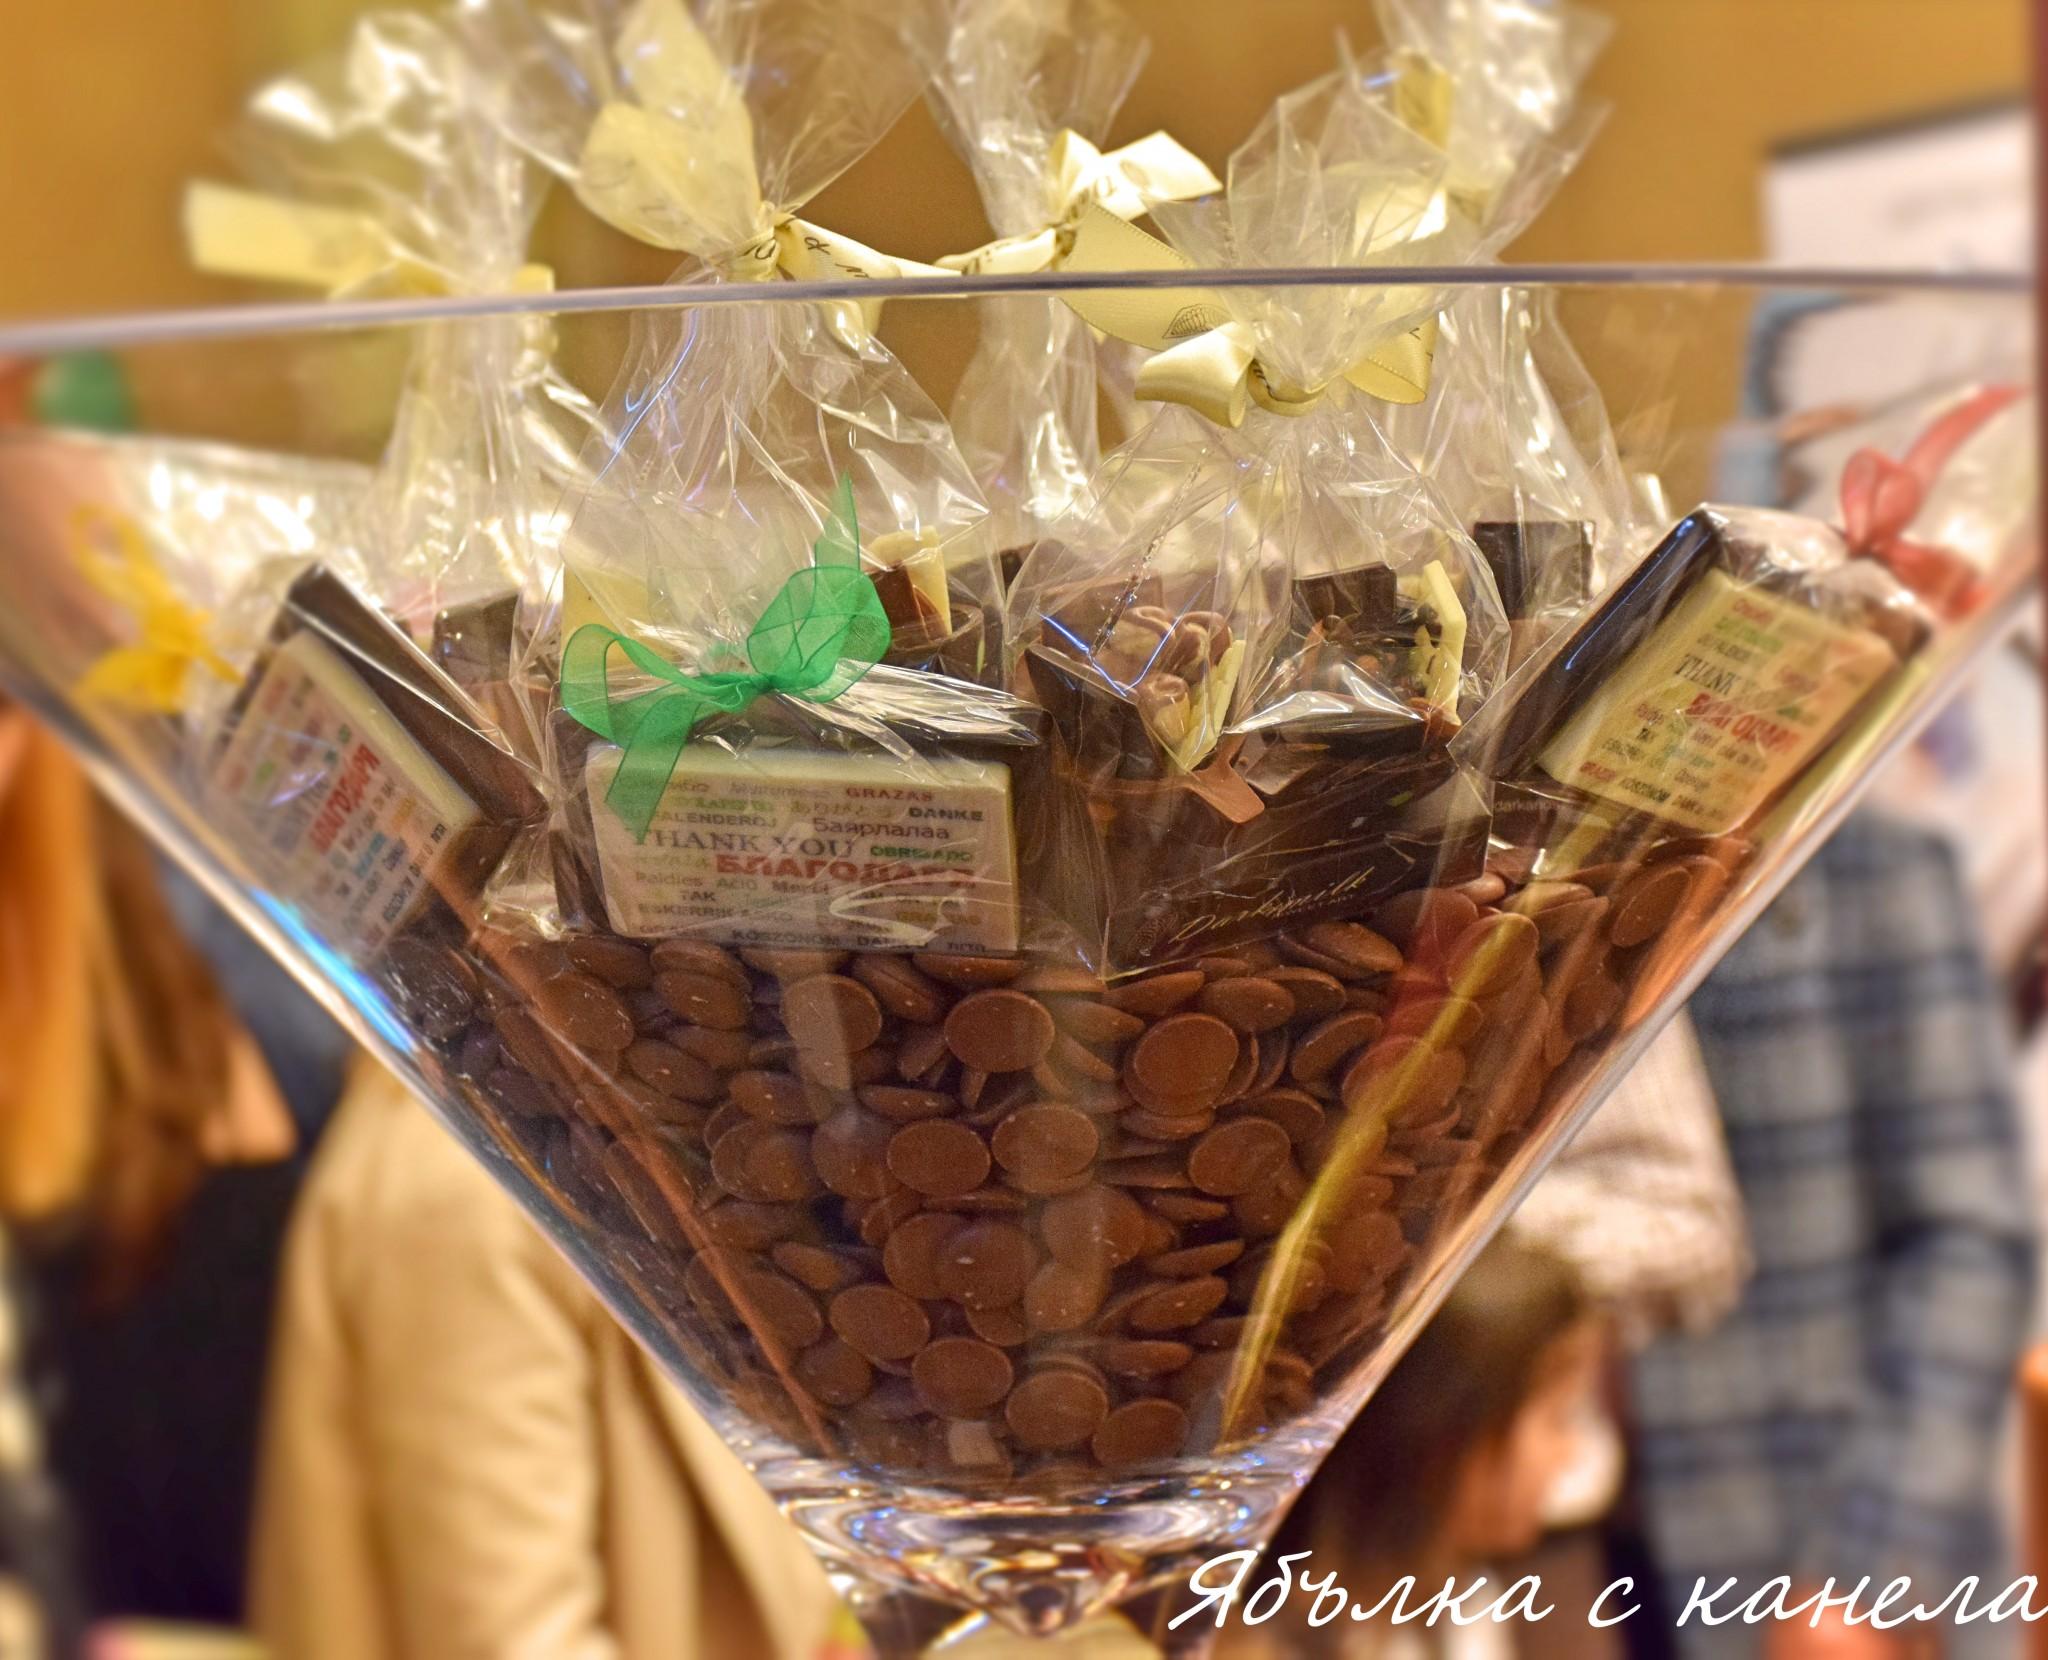 Grand Chocolate Festival